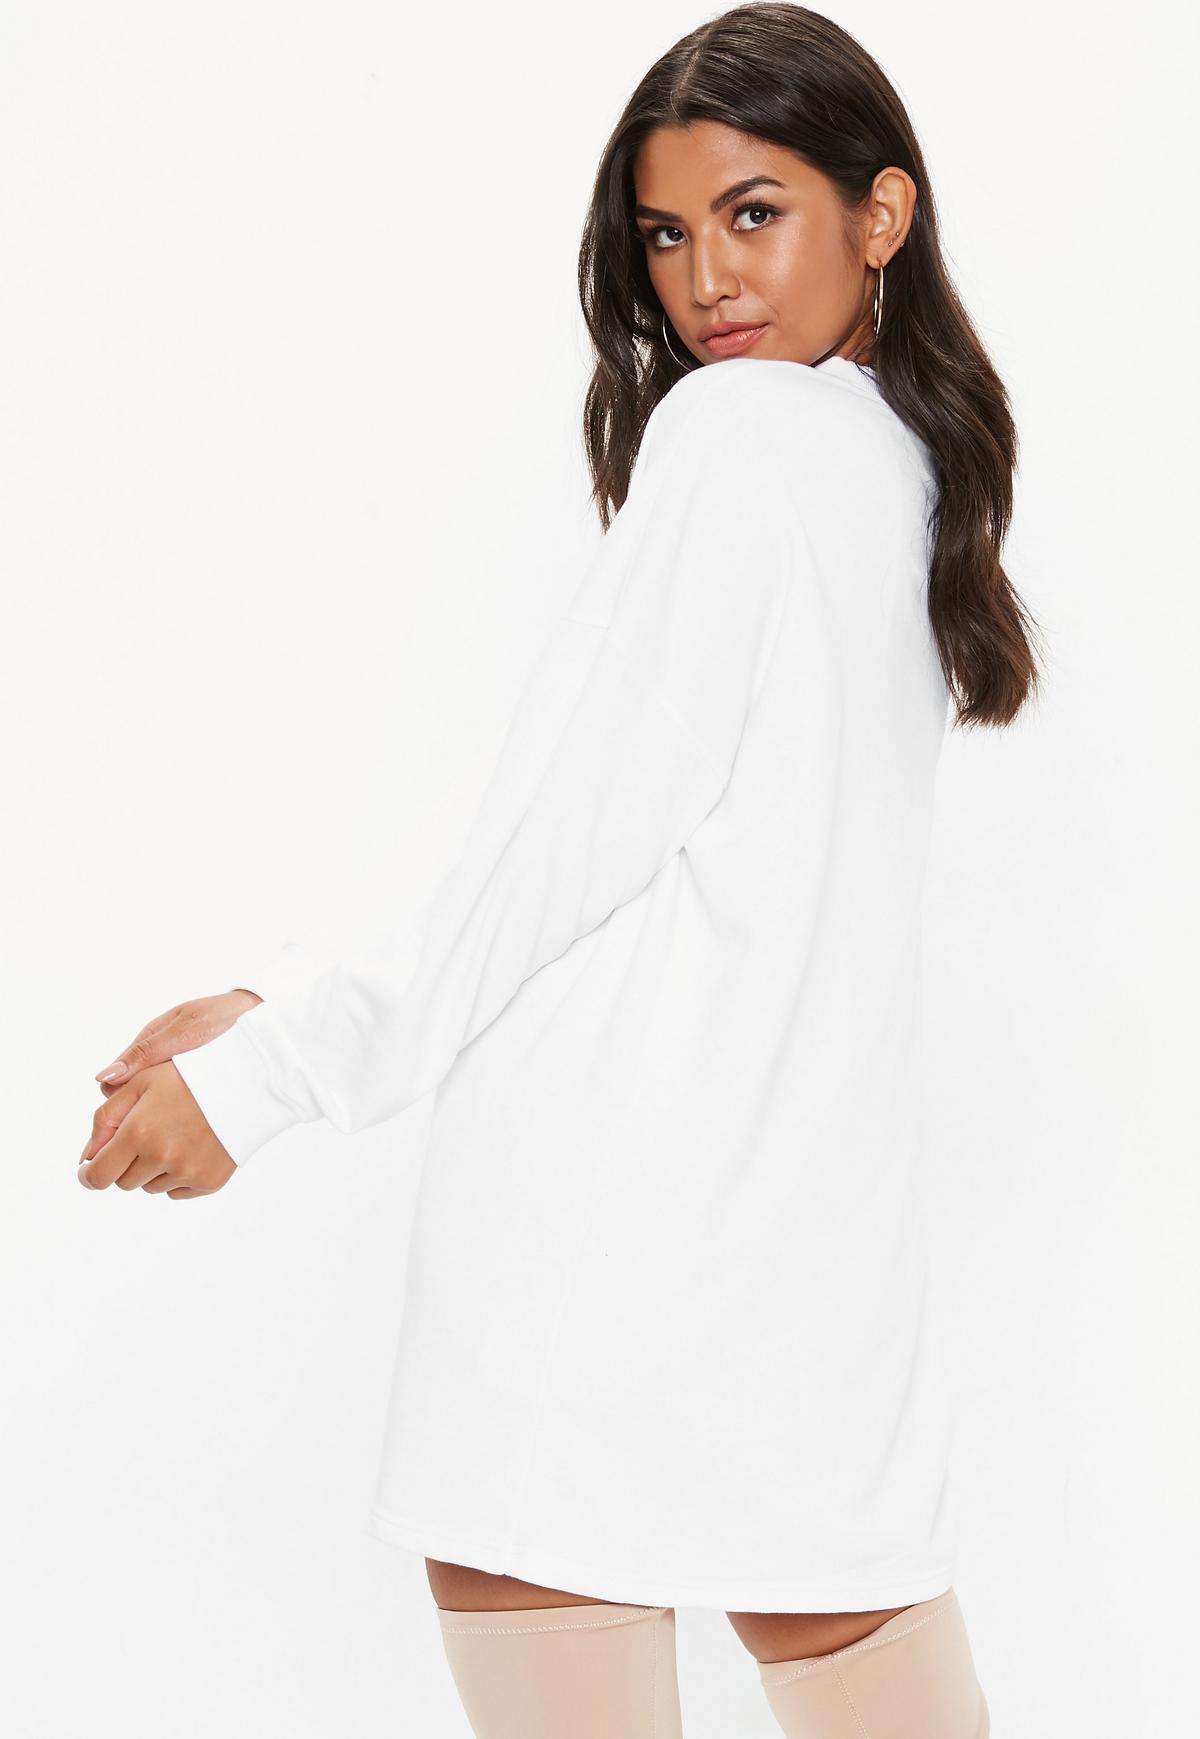 misgguided bluza biała